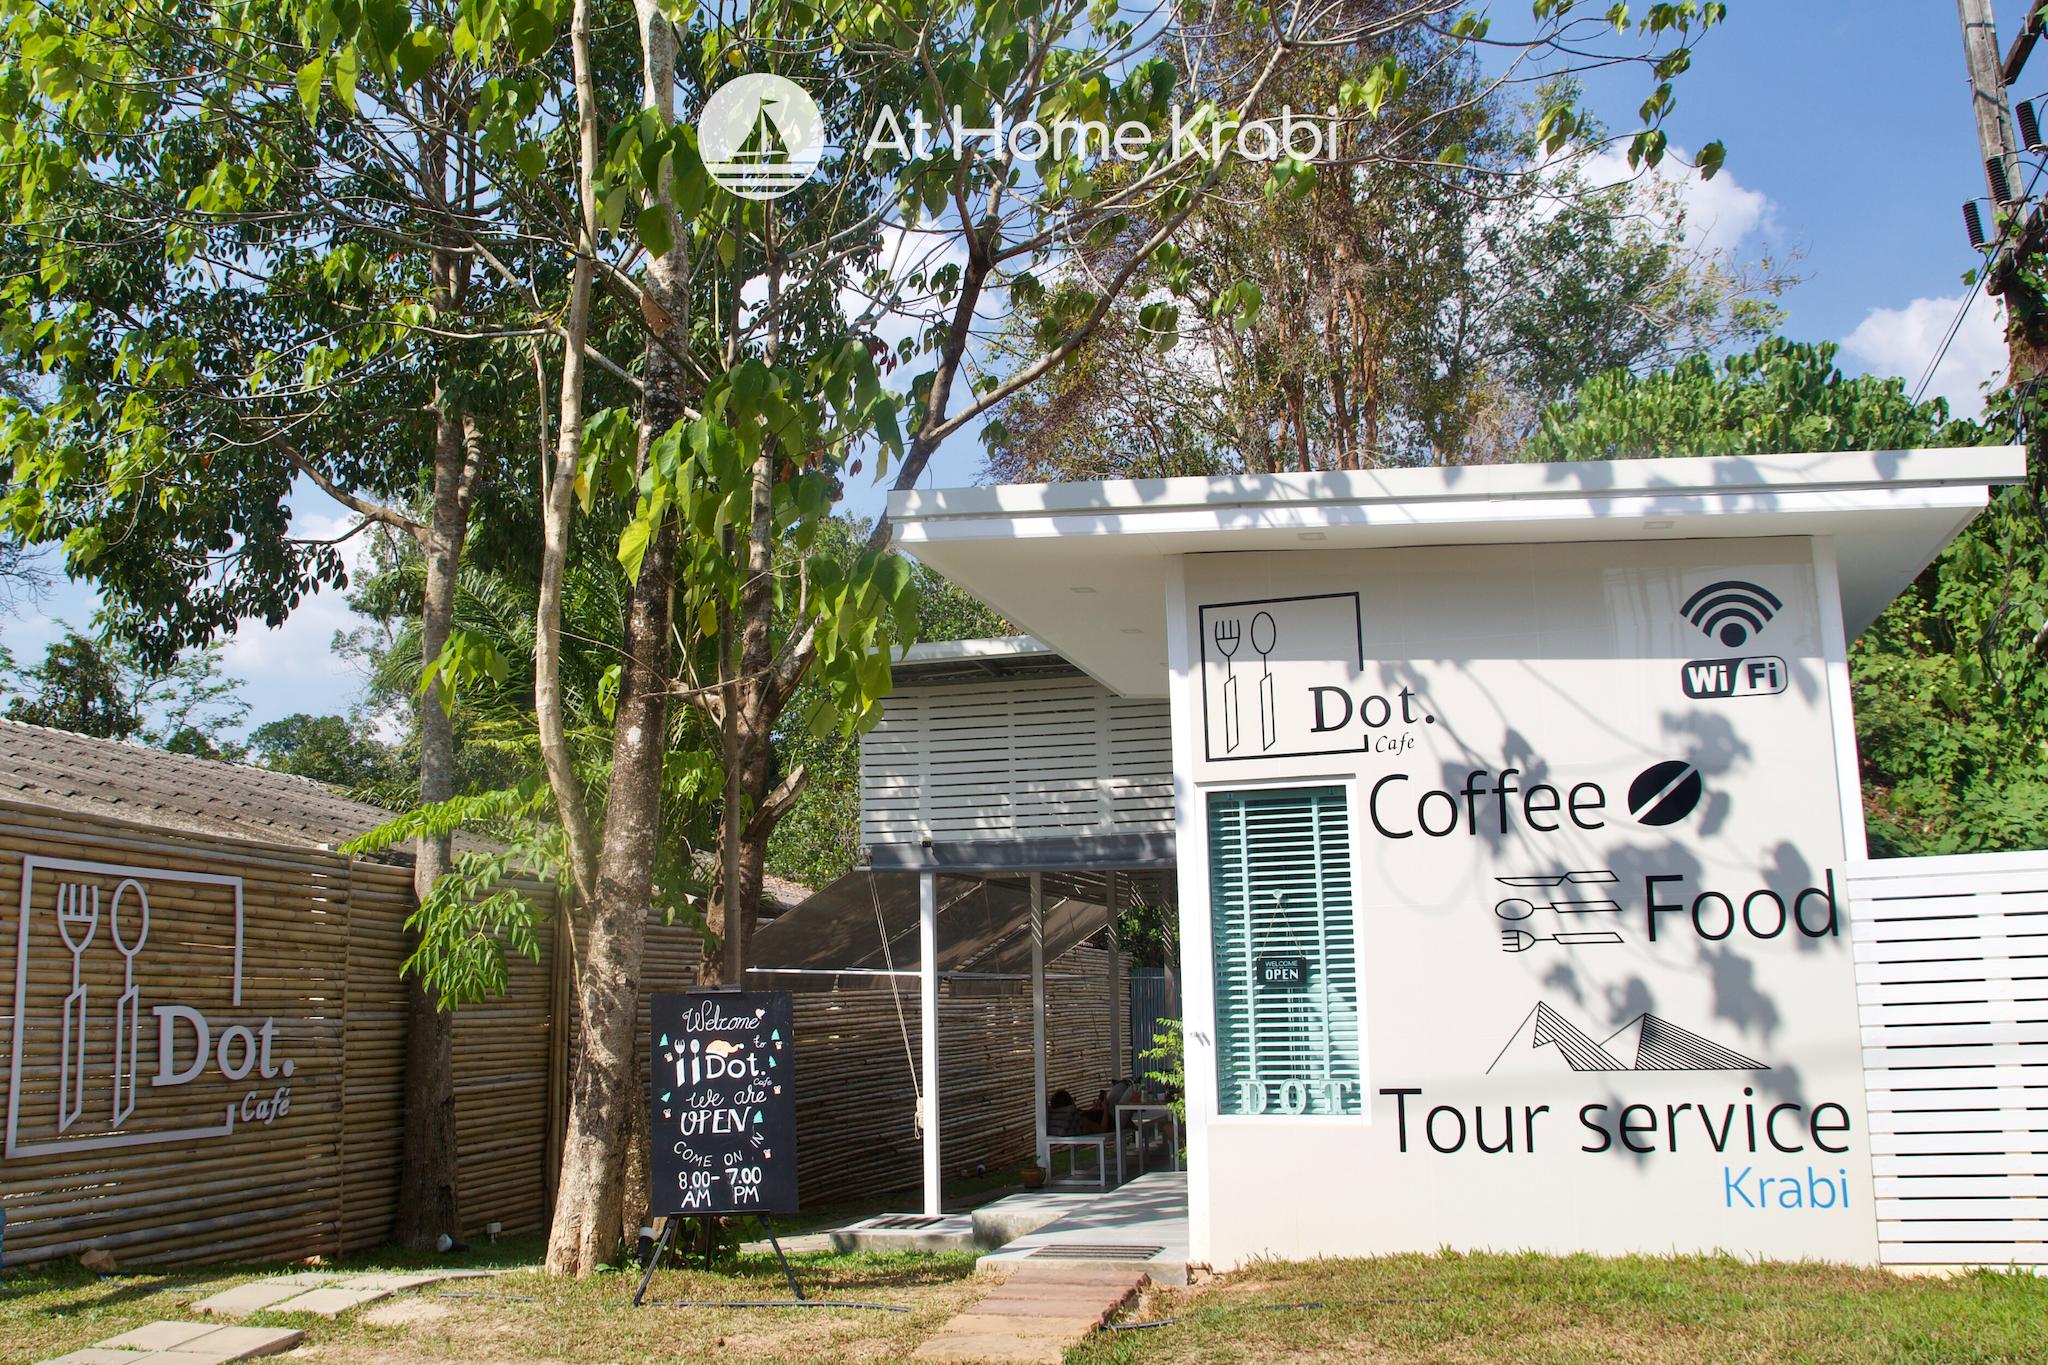 Alex Pool Villa Ao Nang Soi 1 / FREE TUKTUK วิลลา 4 ห้องนอน 4 ห้องน้ำส่วนตัว ขนาด 150 ตร.ม. – อ่าวนาง